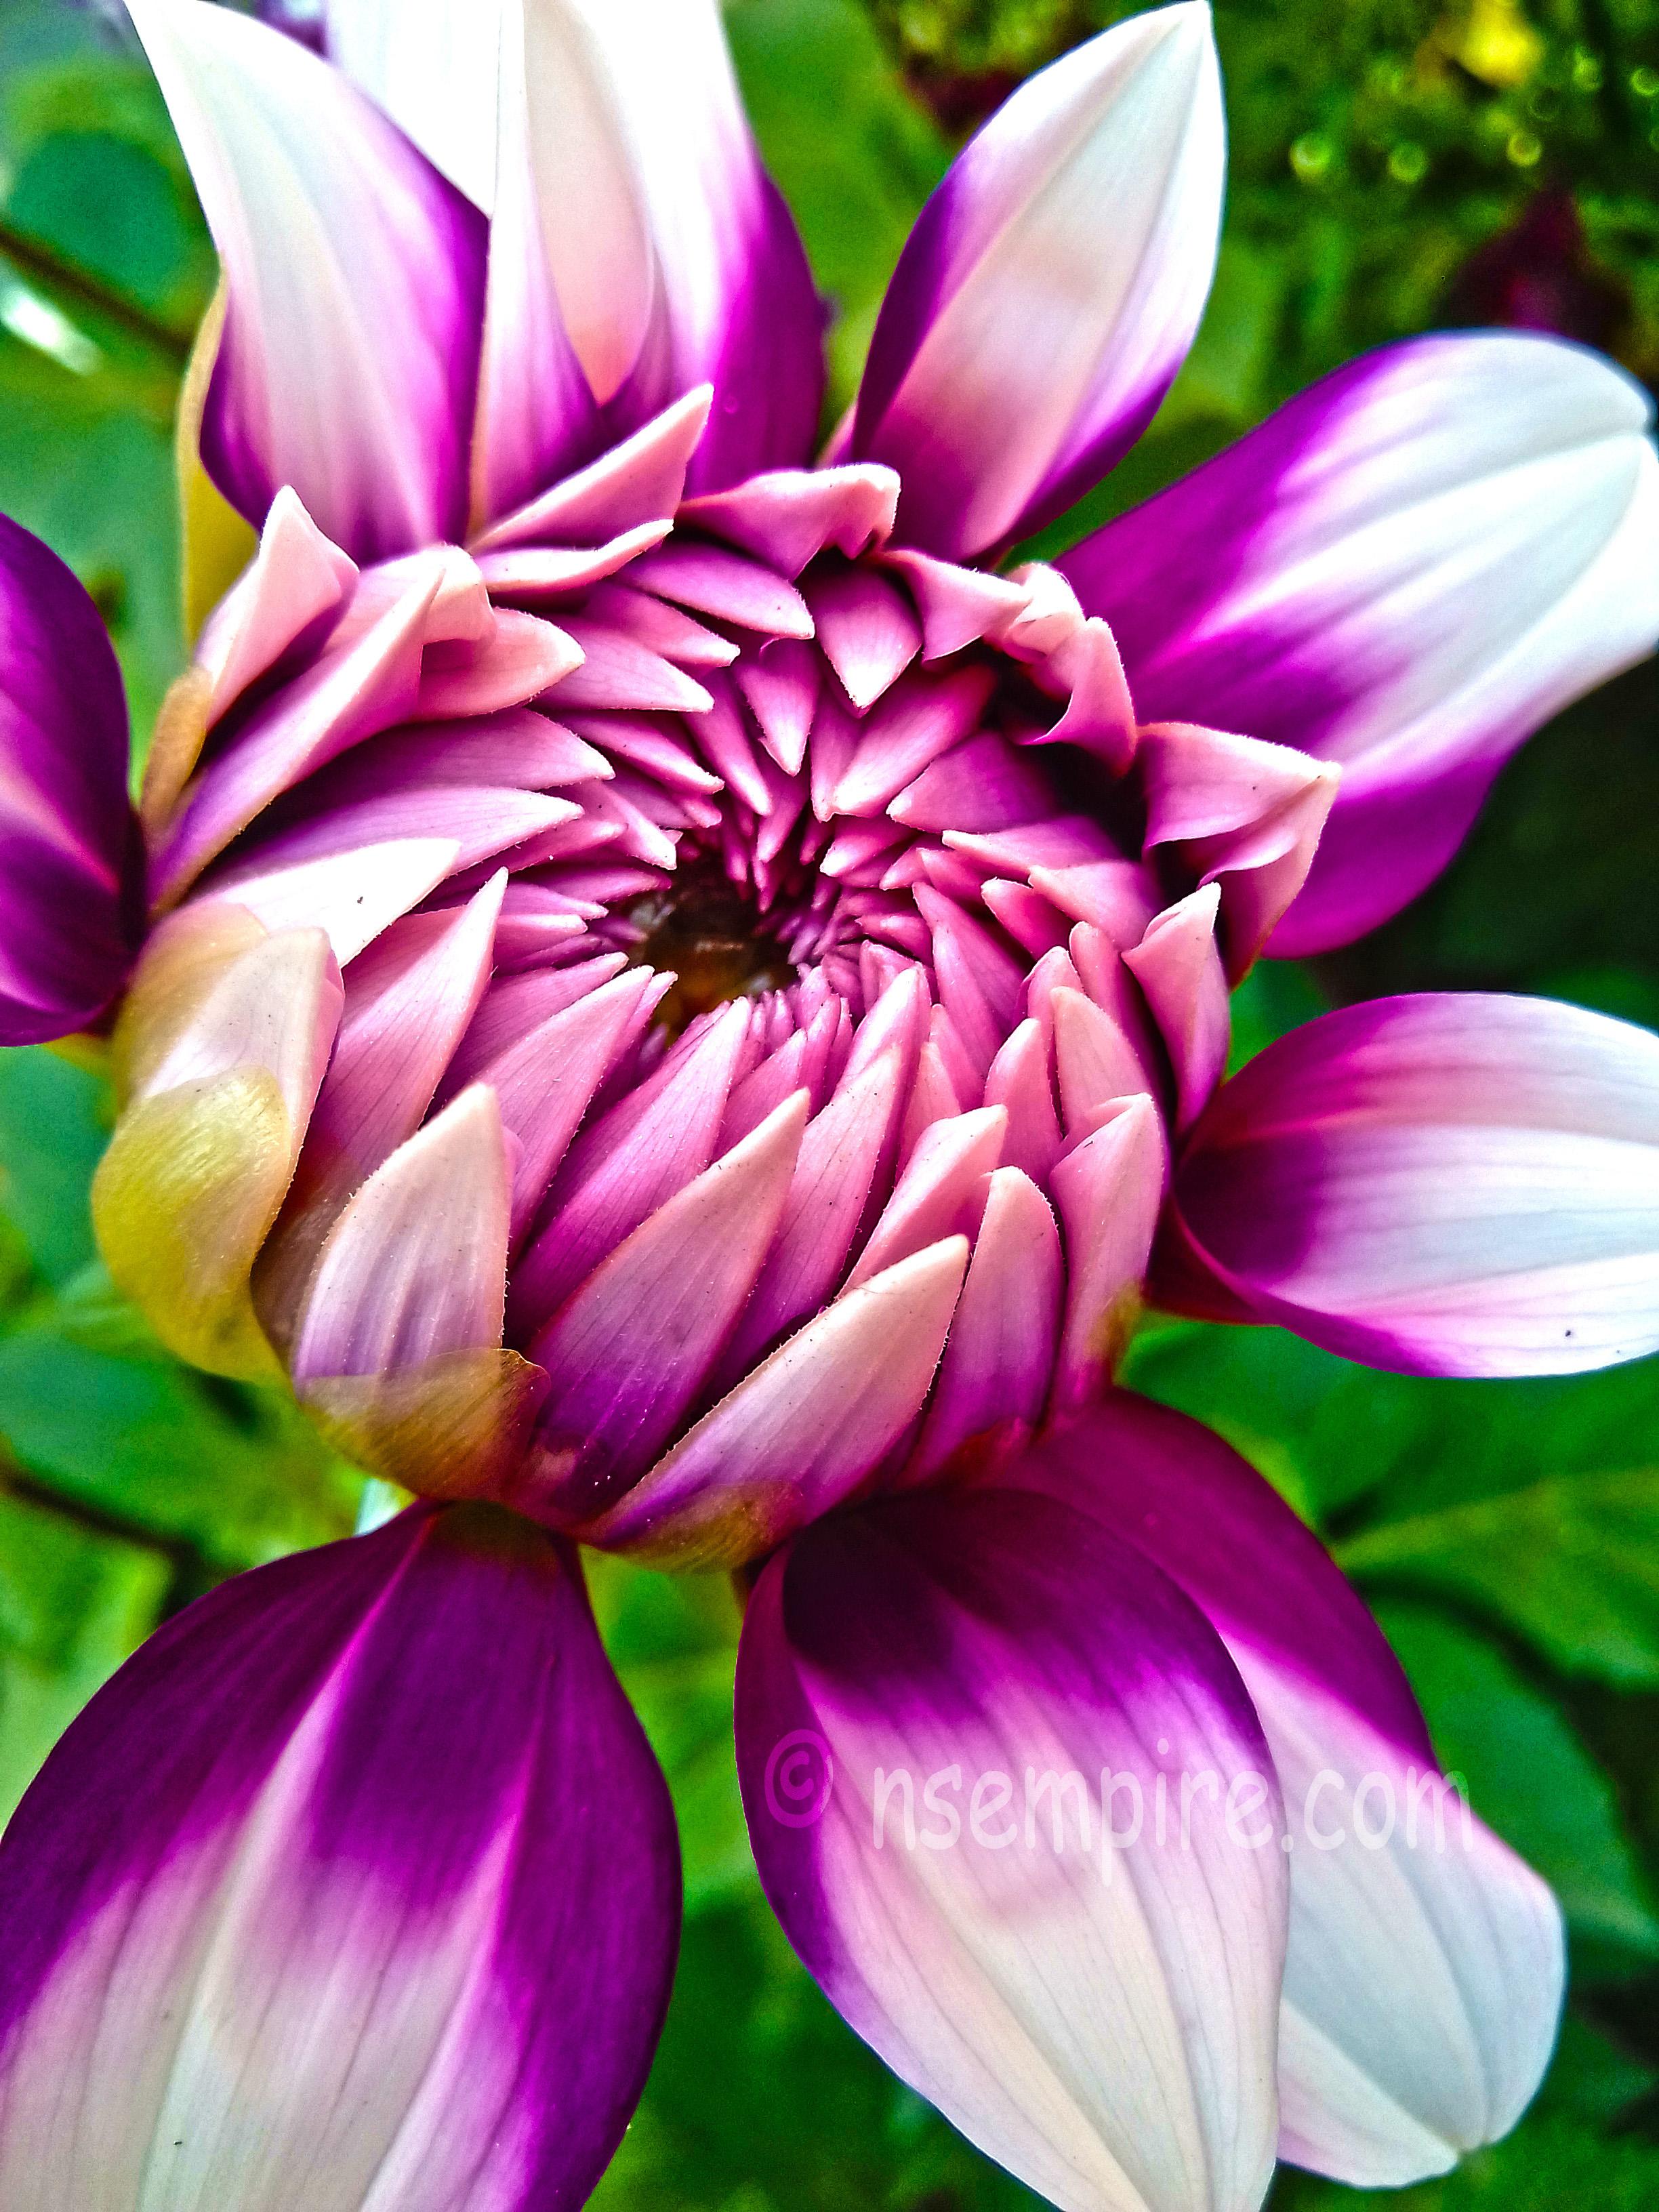 This flower is Jowey Winnie dahlia